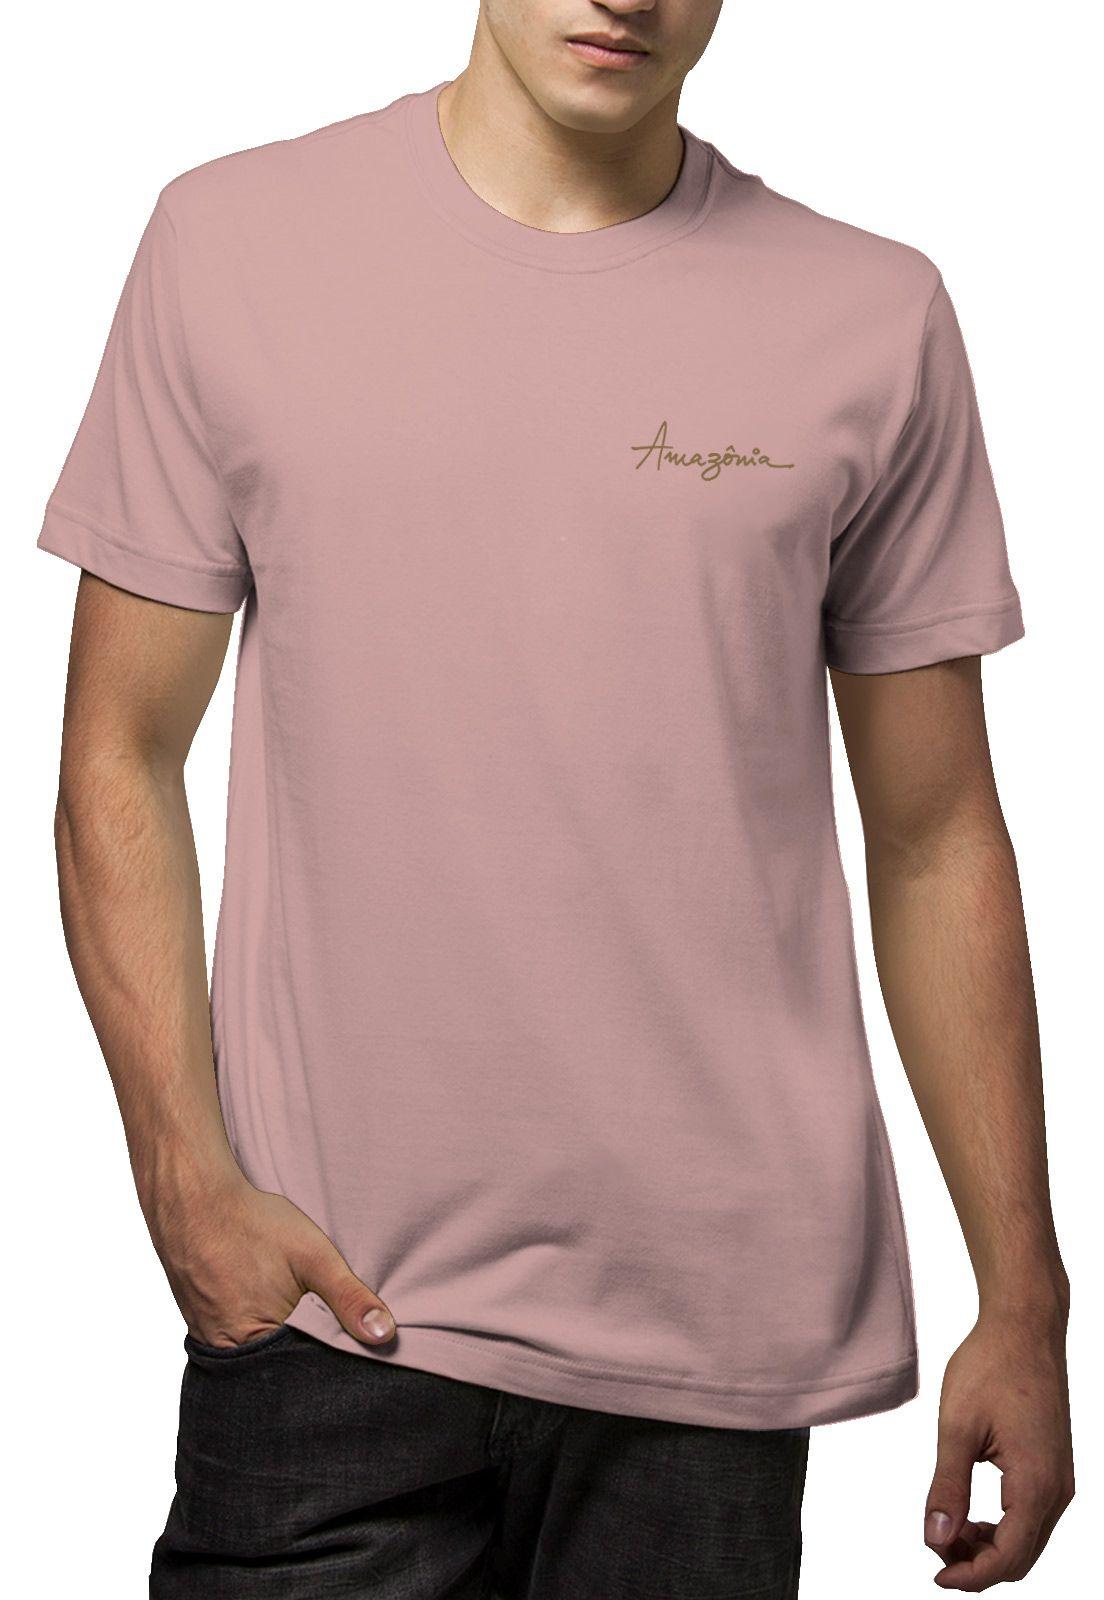 Camiseta Amazônia Pena Pássaros - Rosa Claro